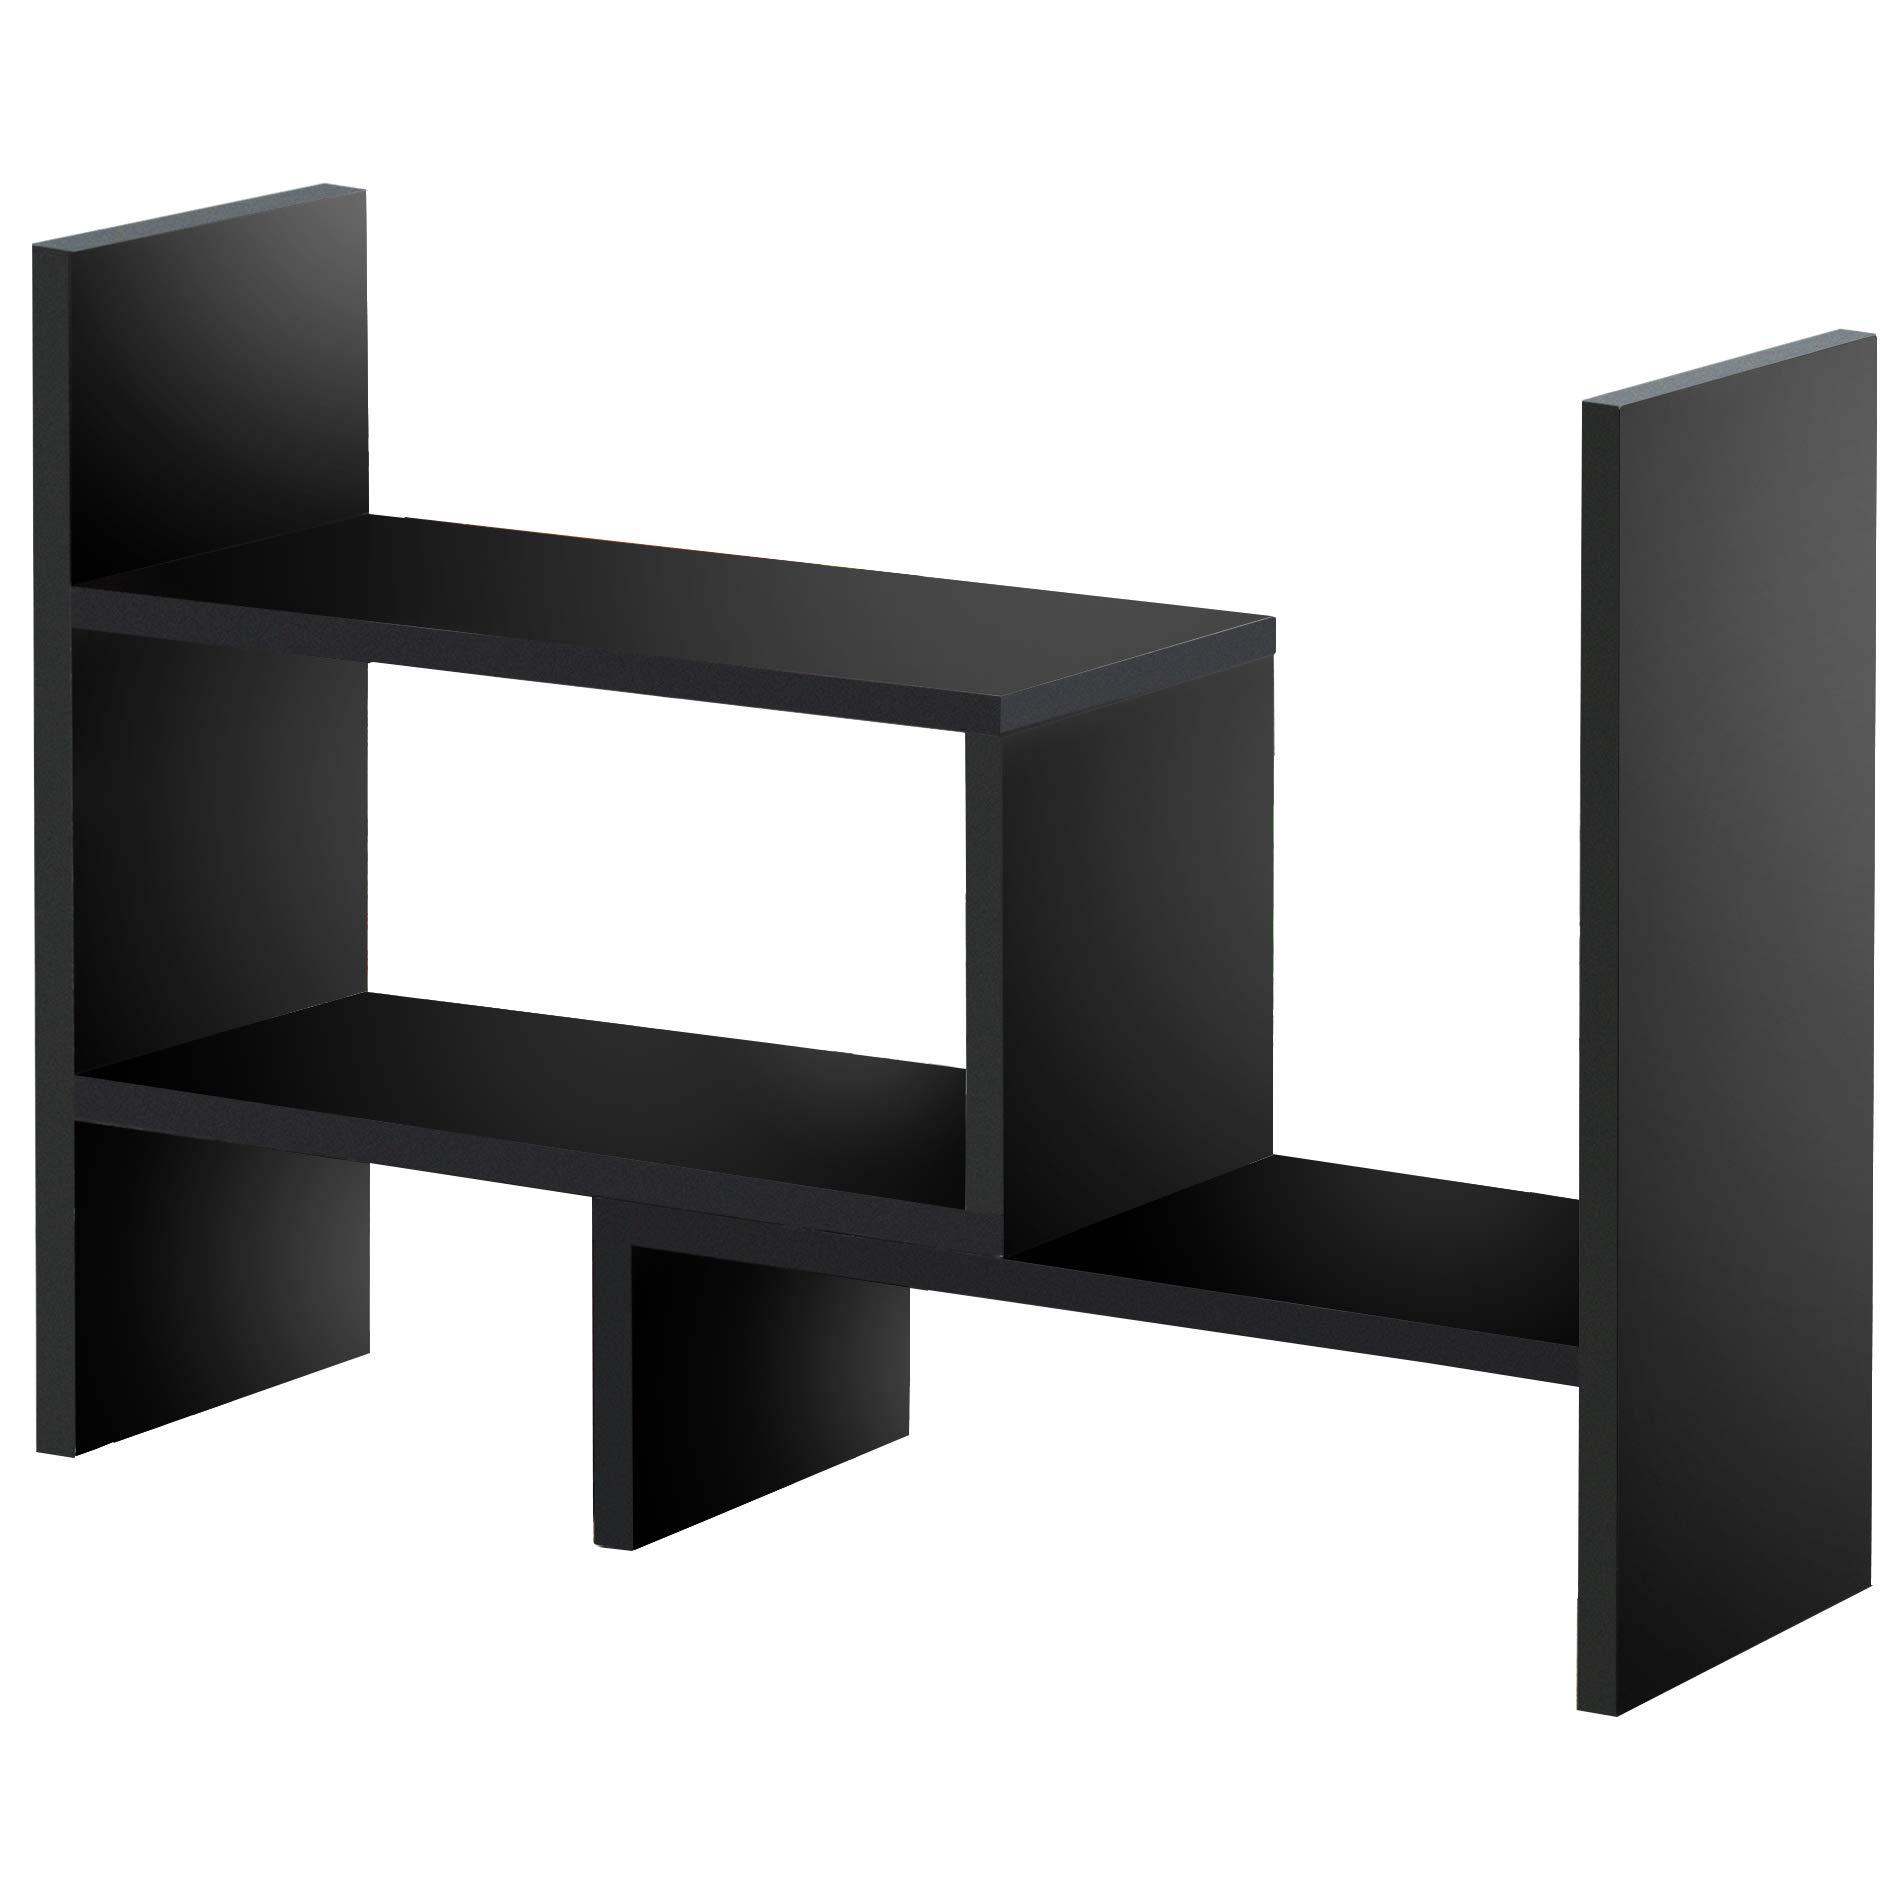 FITUEYES Desktop Organizer Office Storage Rack Adjustable Wood Display Shelf - Free Style Display True Natural Stand Shelf Rack Counter Top BookcasShelf Rack Counter Top Bookcase DT306801WB